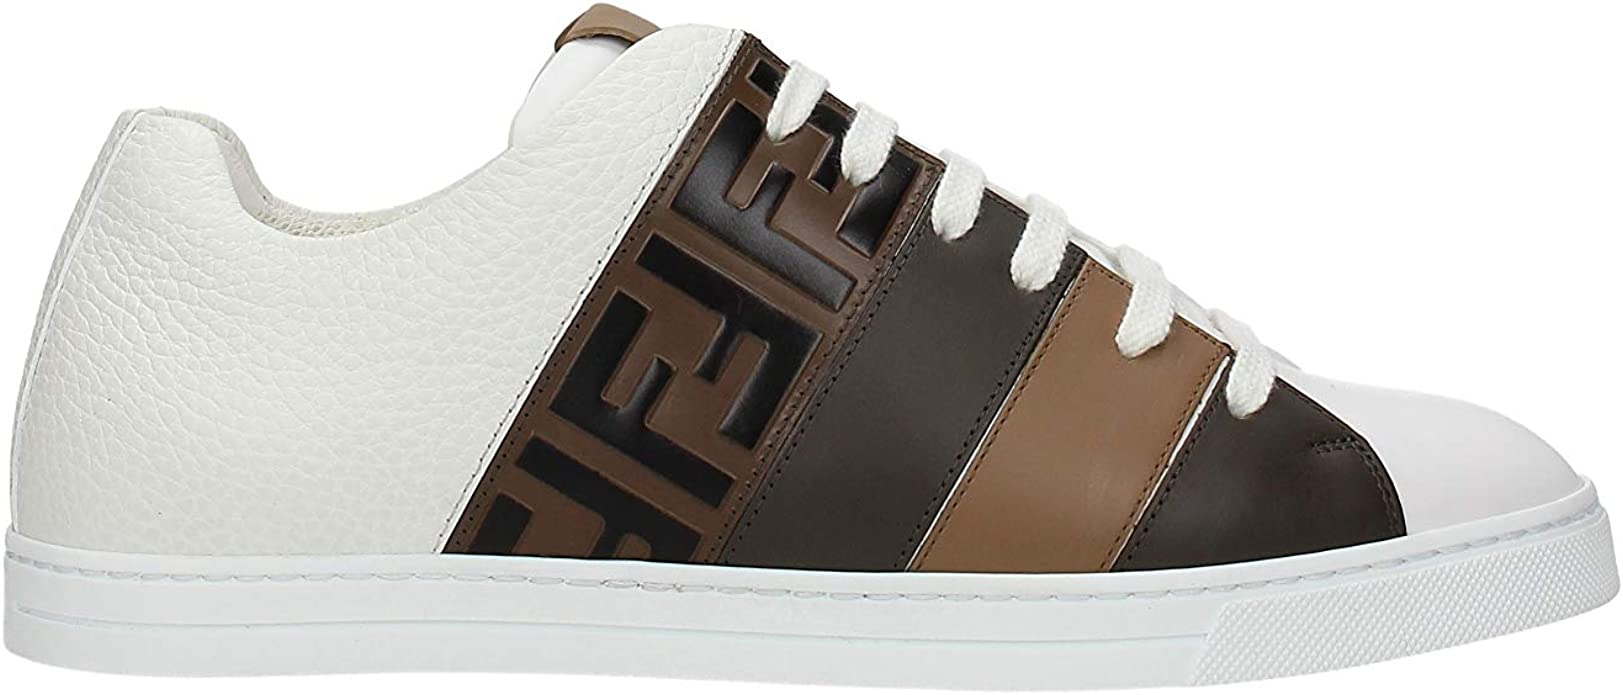 Schuhe herren Fendi | Sneakers Fendi Herren Weiß | Sneakers